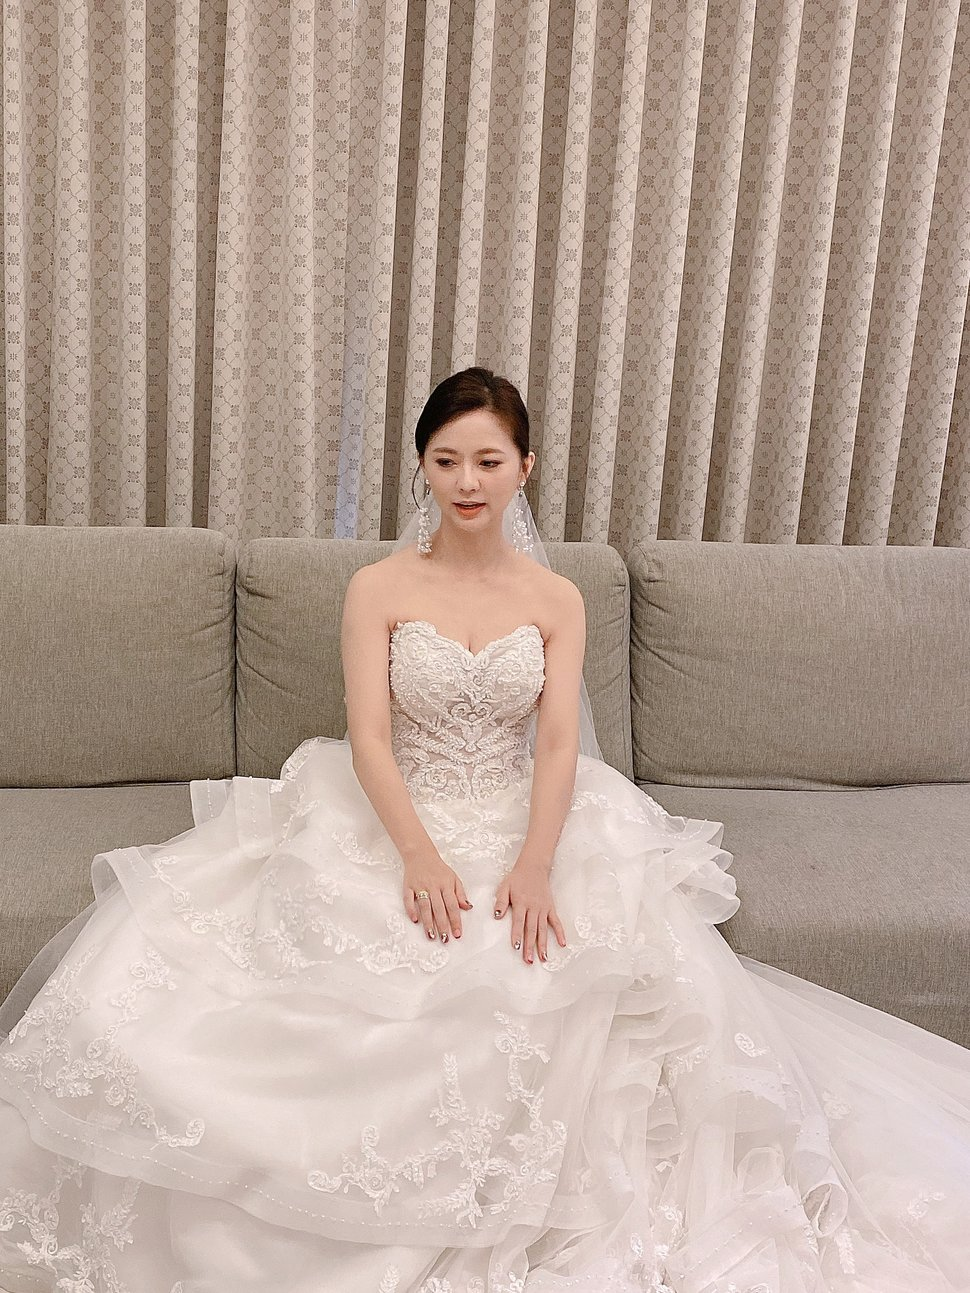 E99DB3A9-2EB7-460A-AD90-6D9093DD0F1A - Ellen wang stylist《結婚吧》